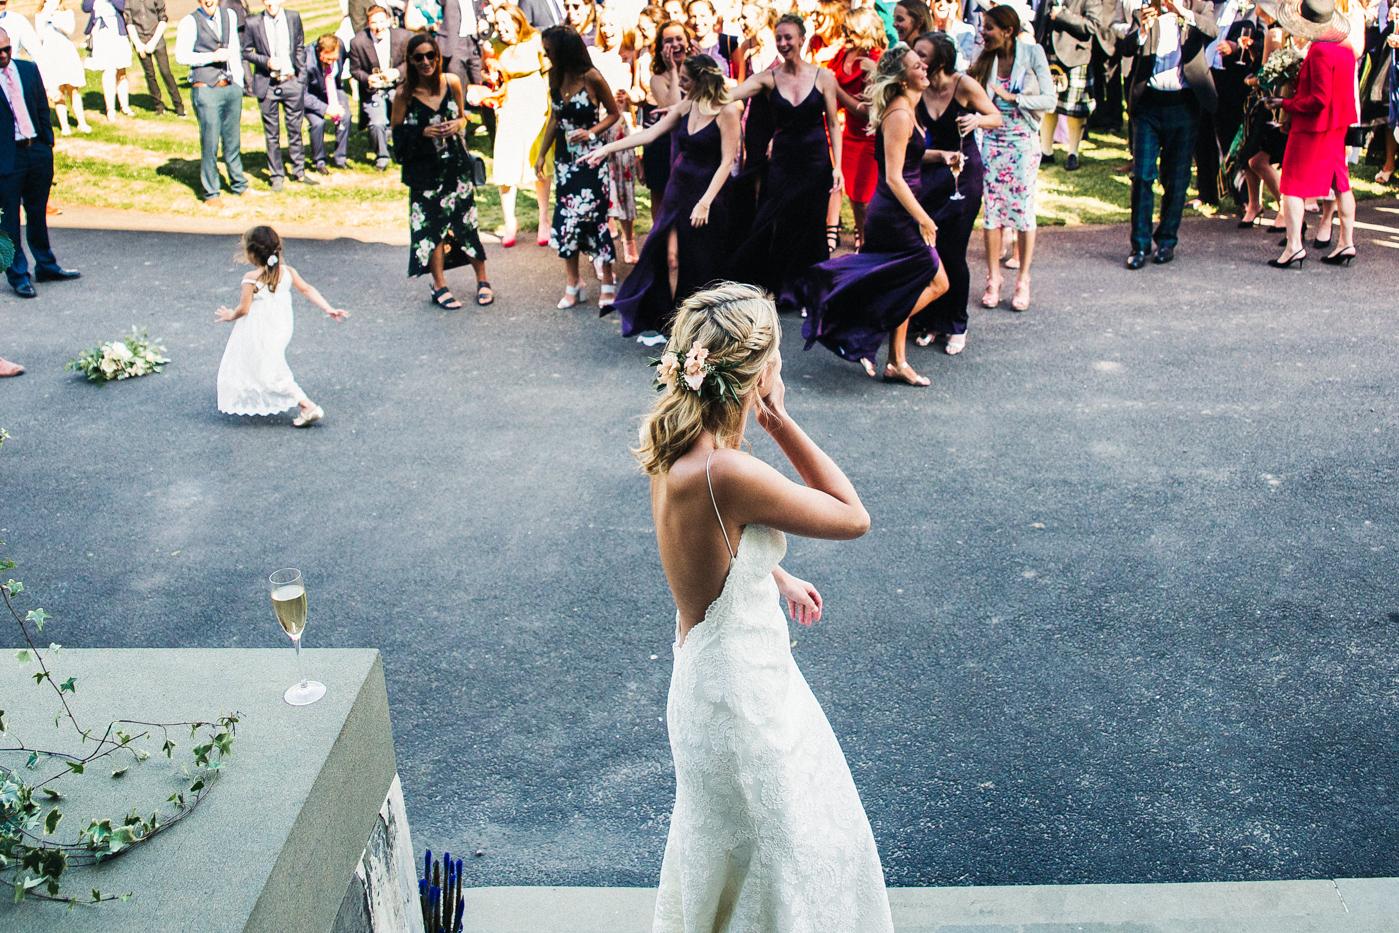 teesside-middlesbrough-north-east-wedding-photographer-creative-wedding-venues-0041.jpg